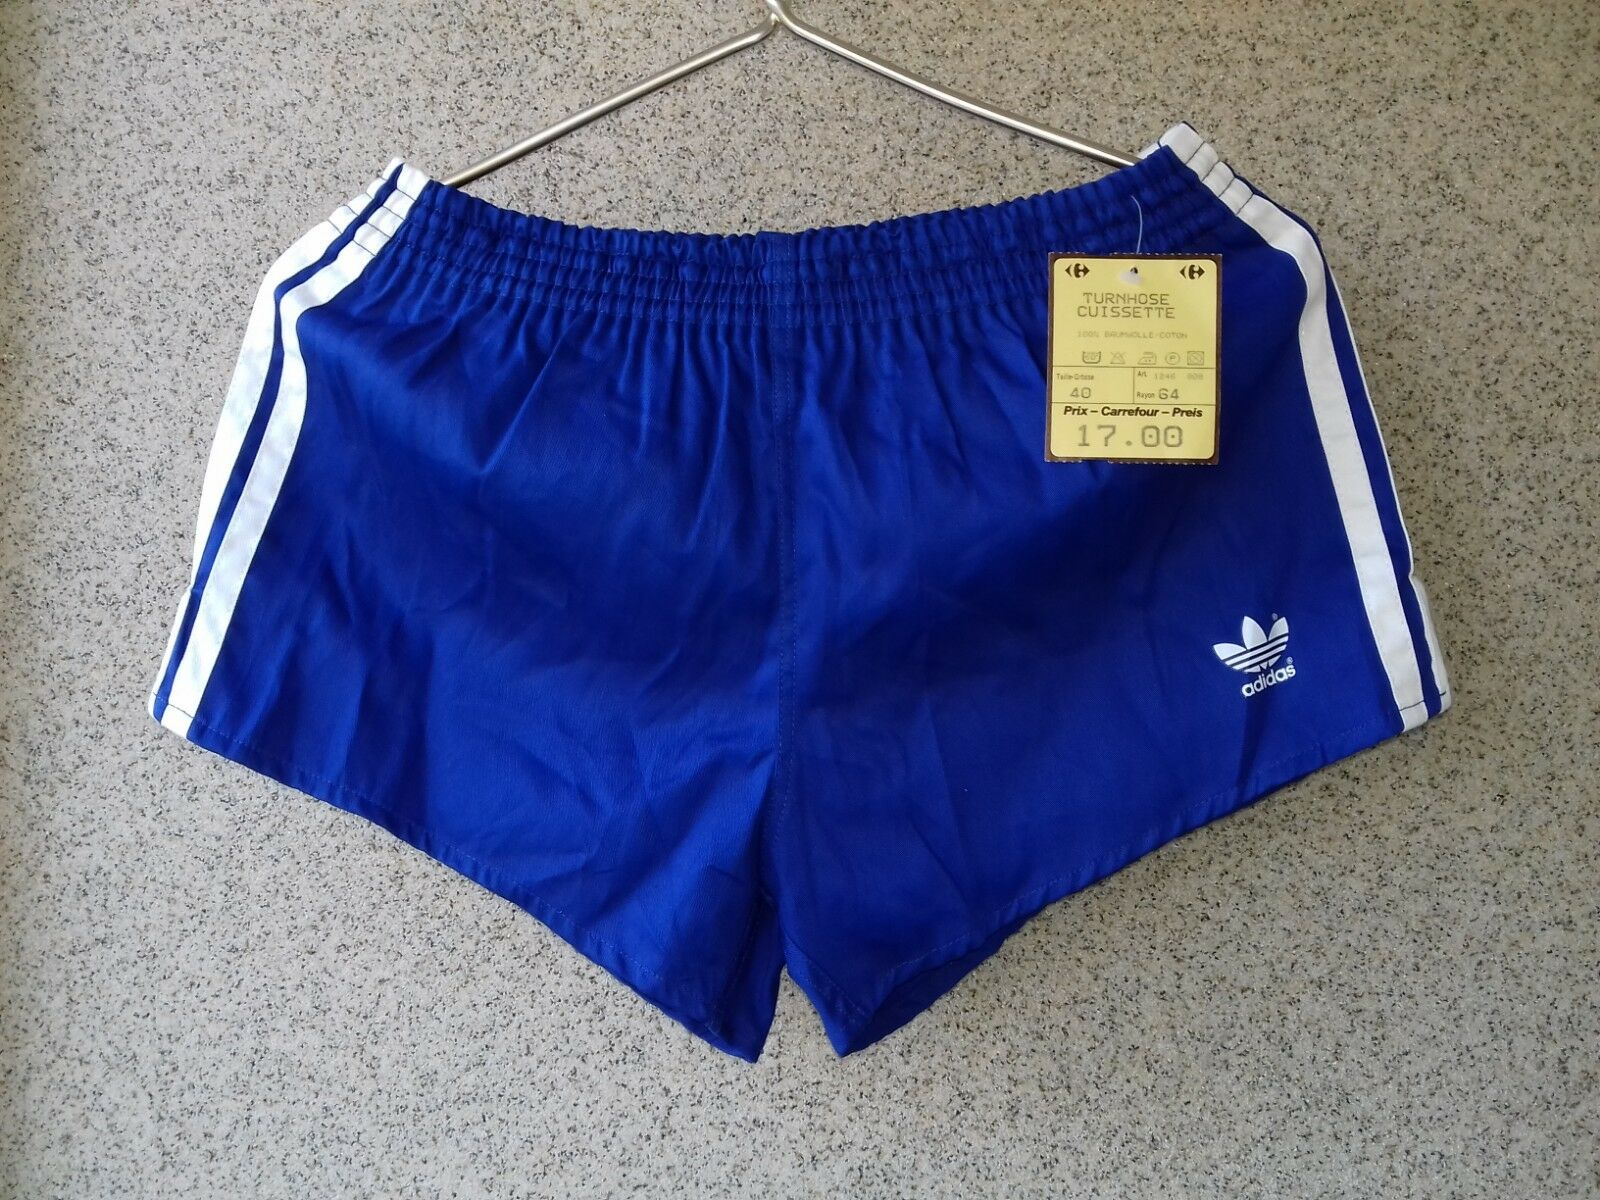 Adidas Blu Vintage Shorts M West Germany Adidas 19801985 OLD Rare